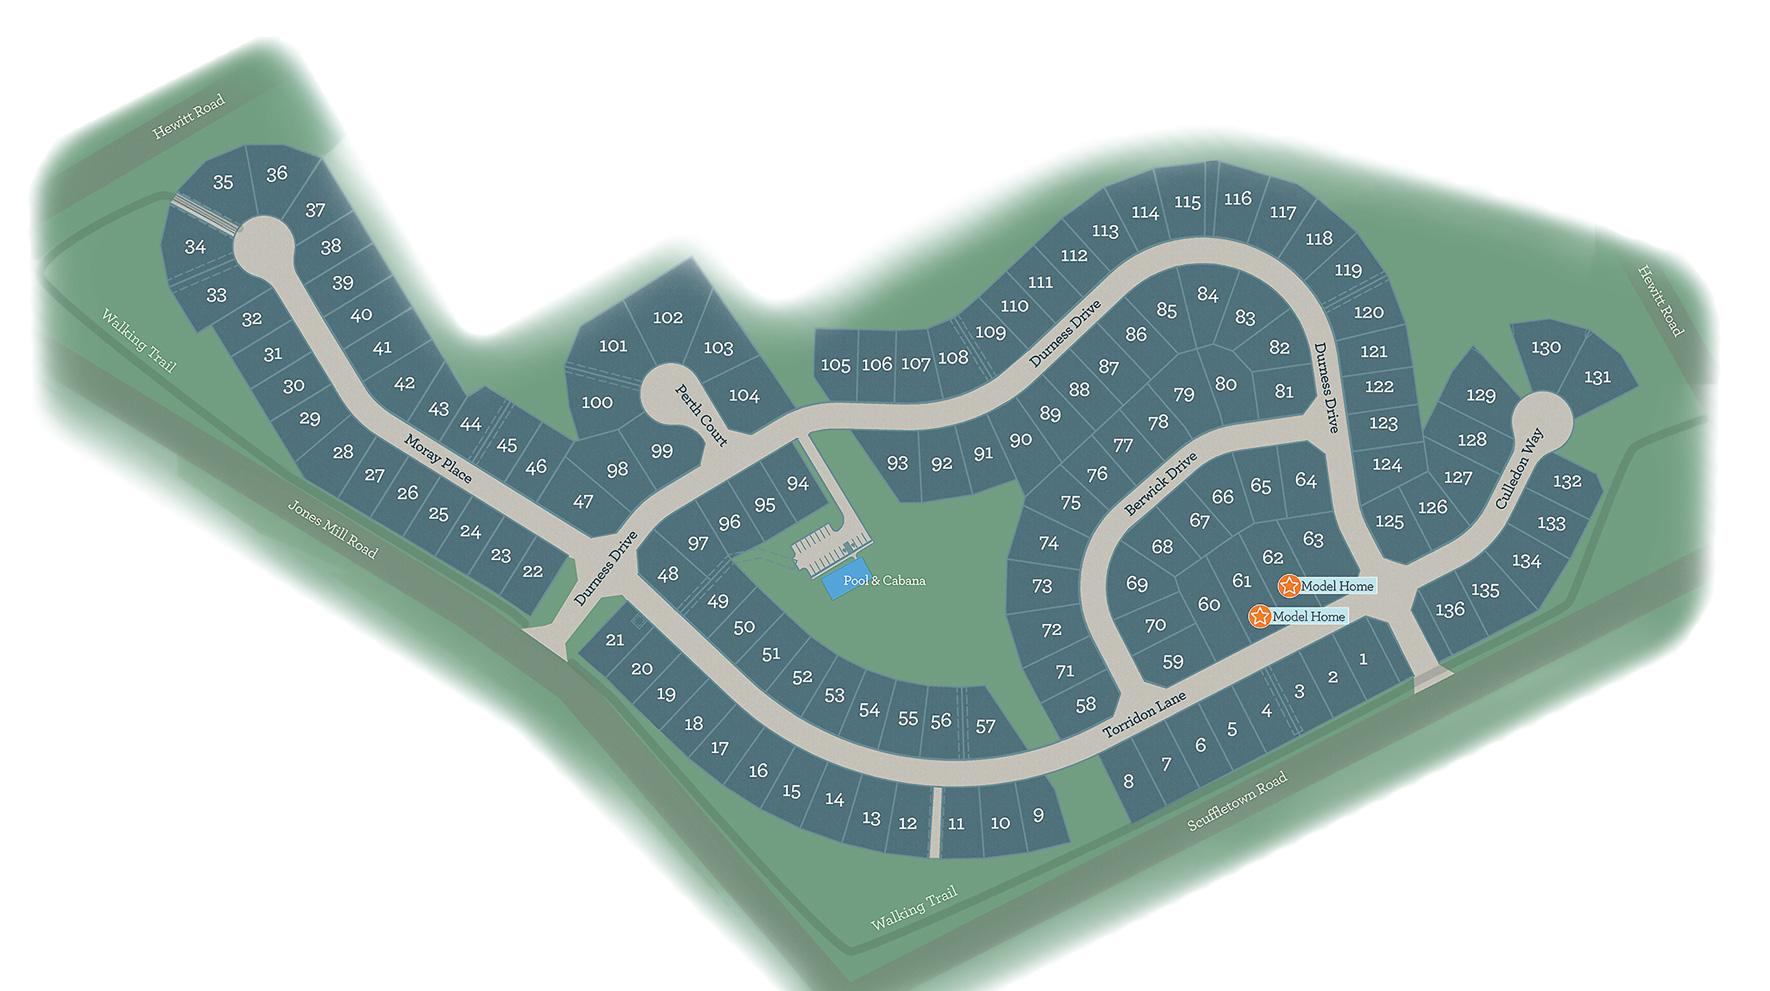 Jones Mill Crossing Site Plan